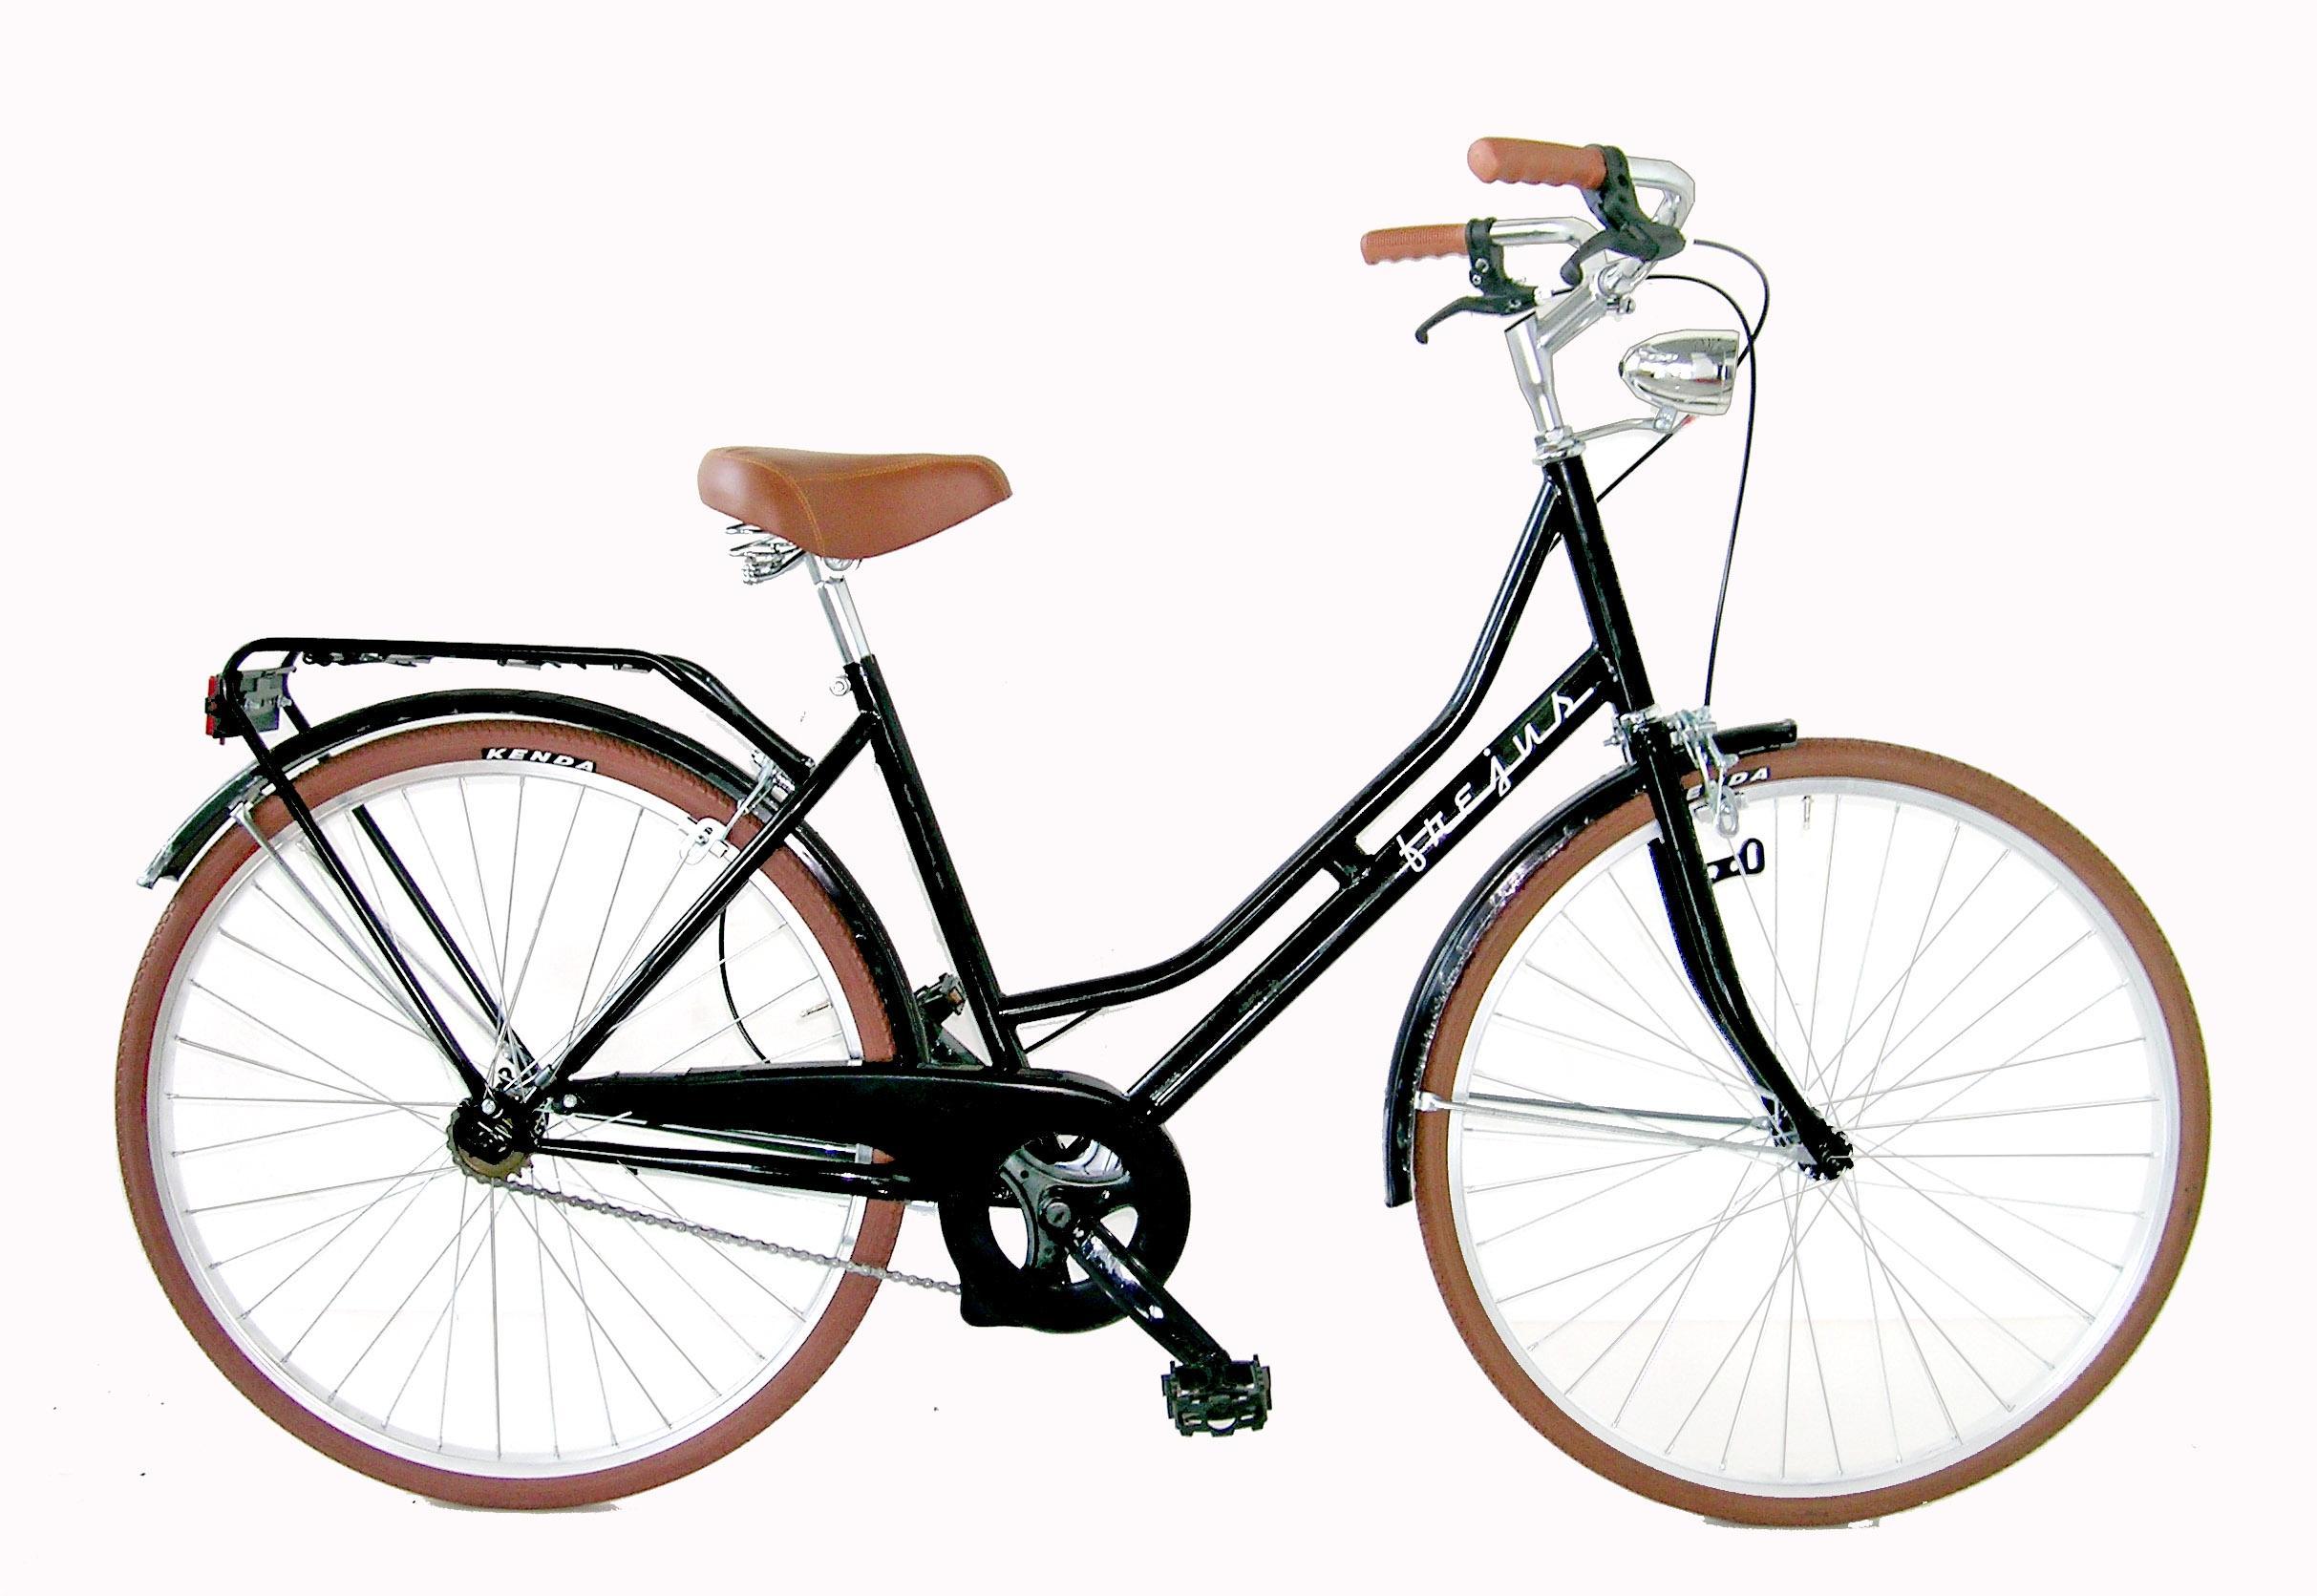 Frejus Htr26000pmo Bicicletta Olanda Retro Monovelocita 26 Nero